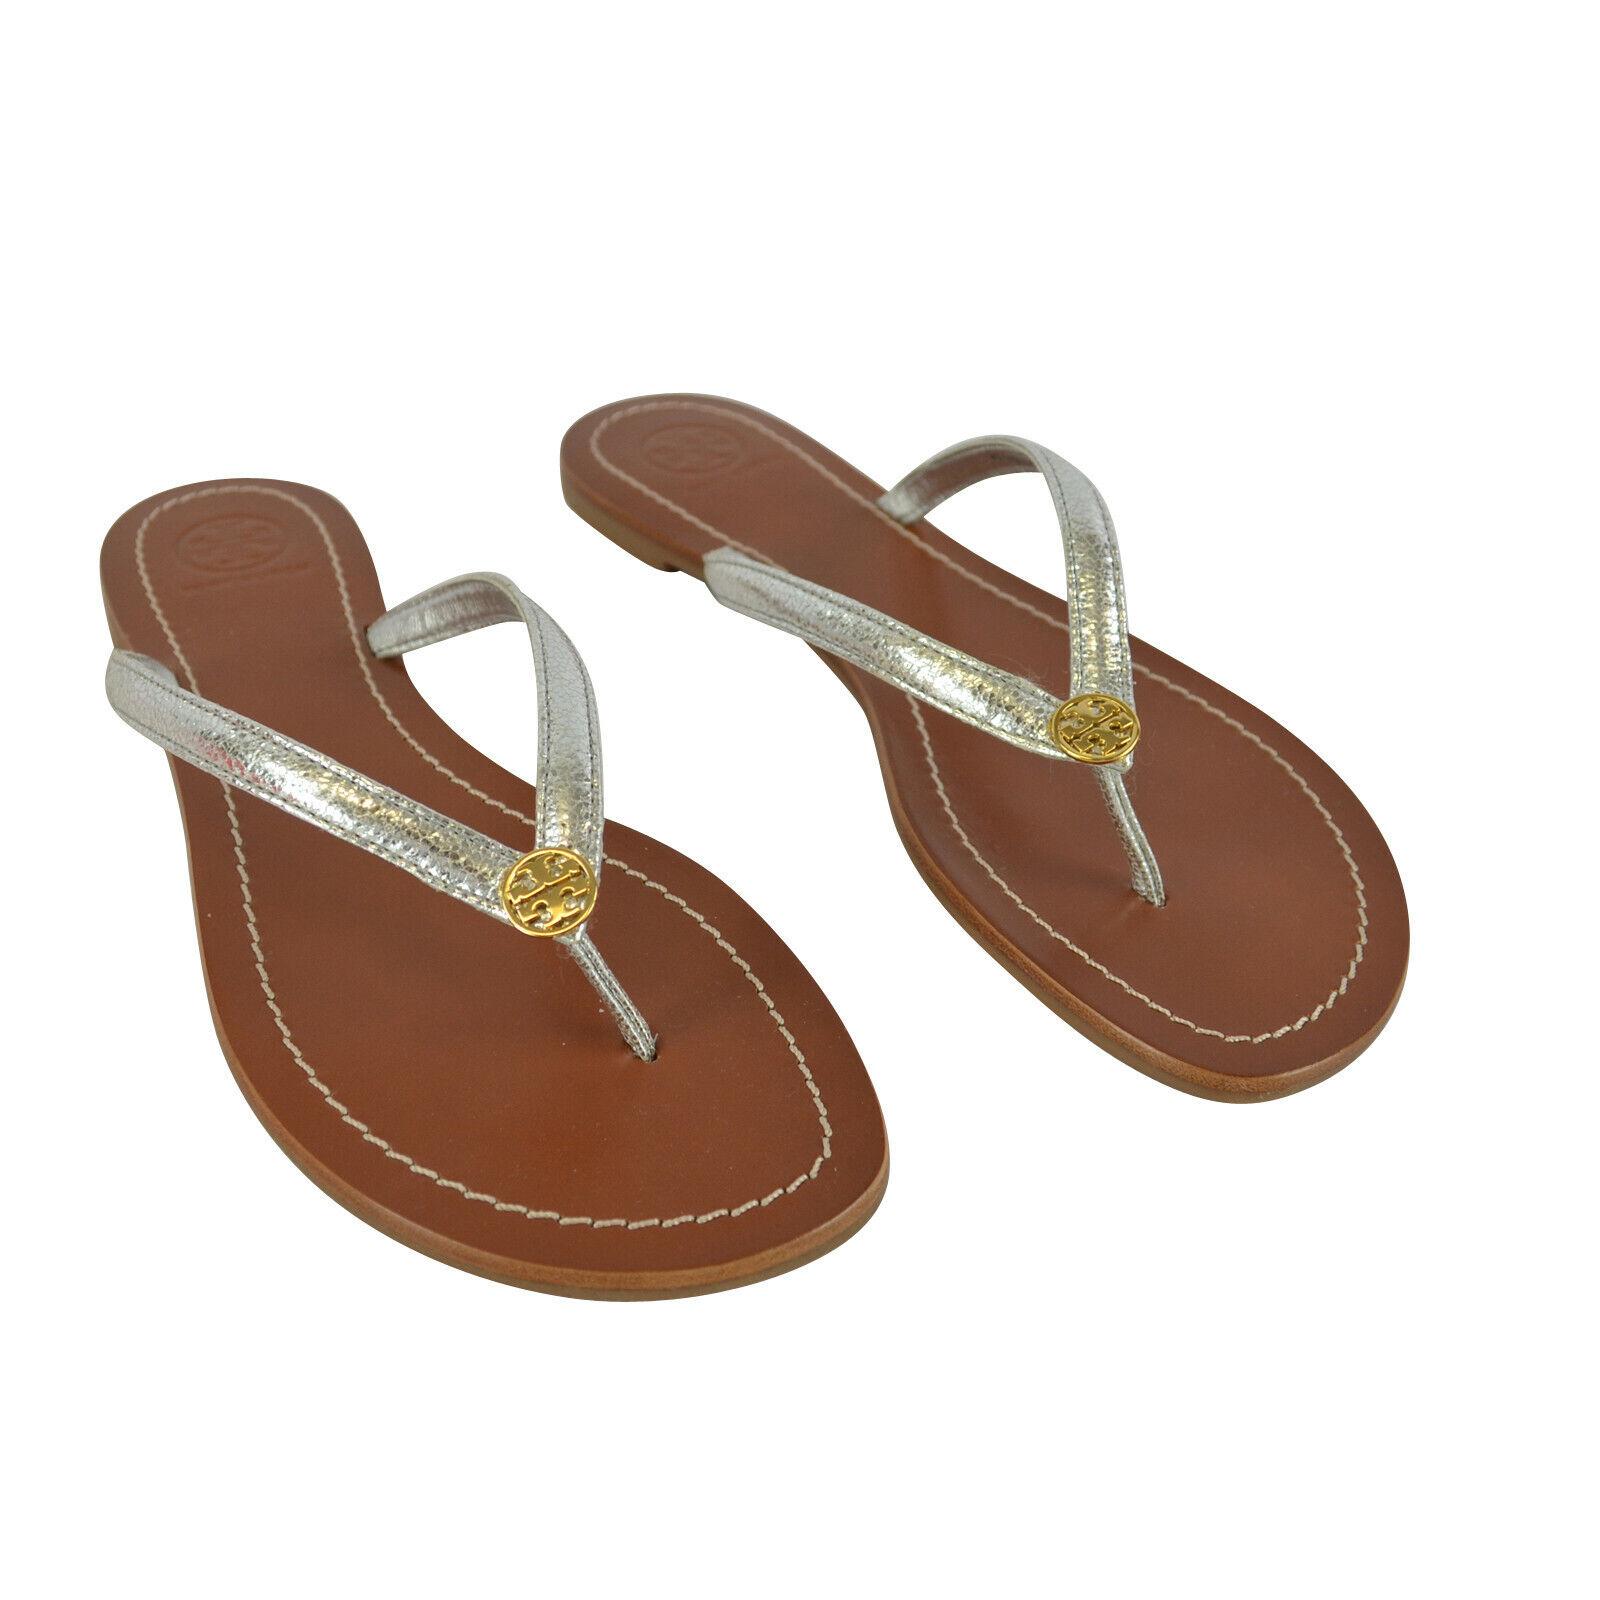 Tory Burch Terra Thong Sandals Silver